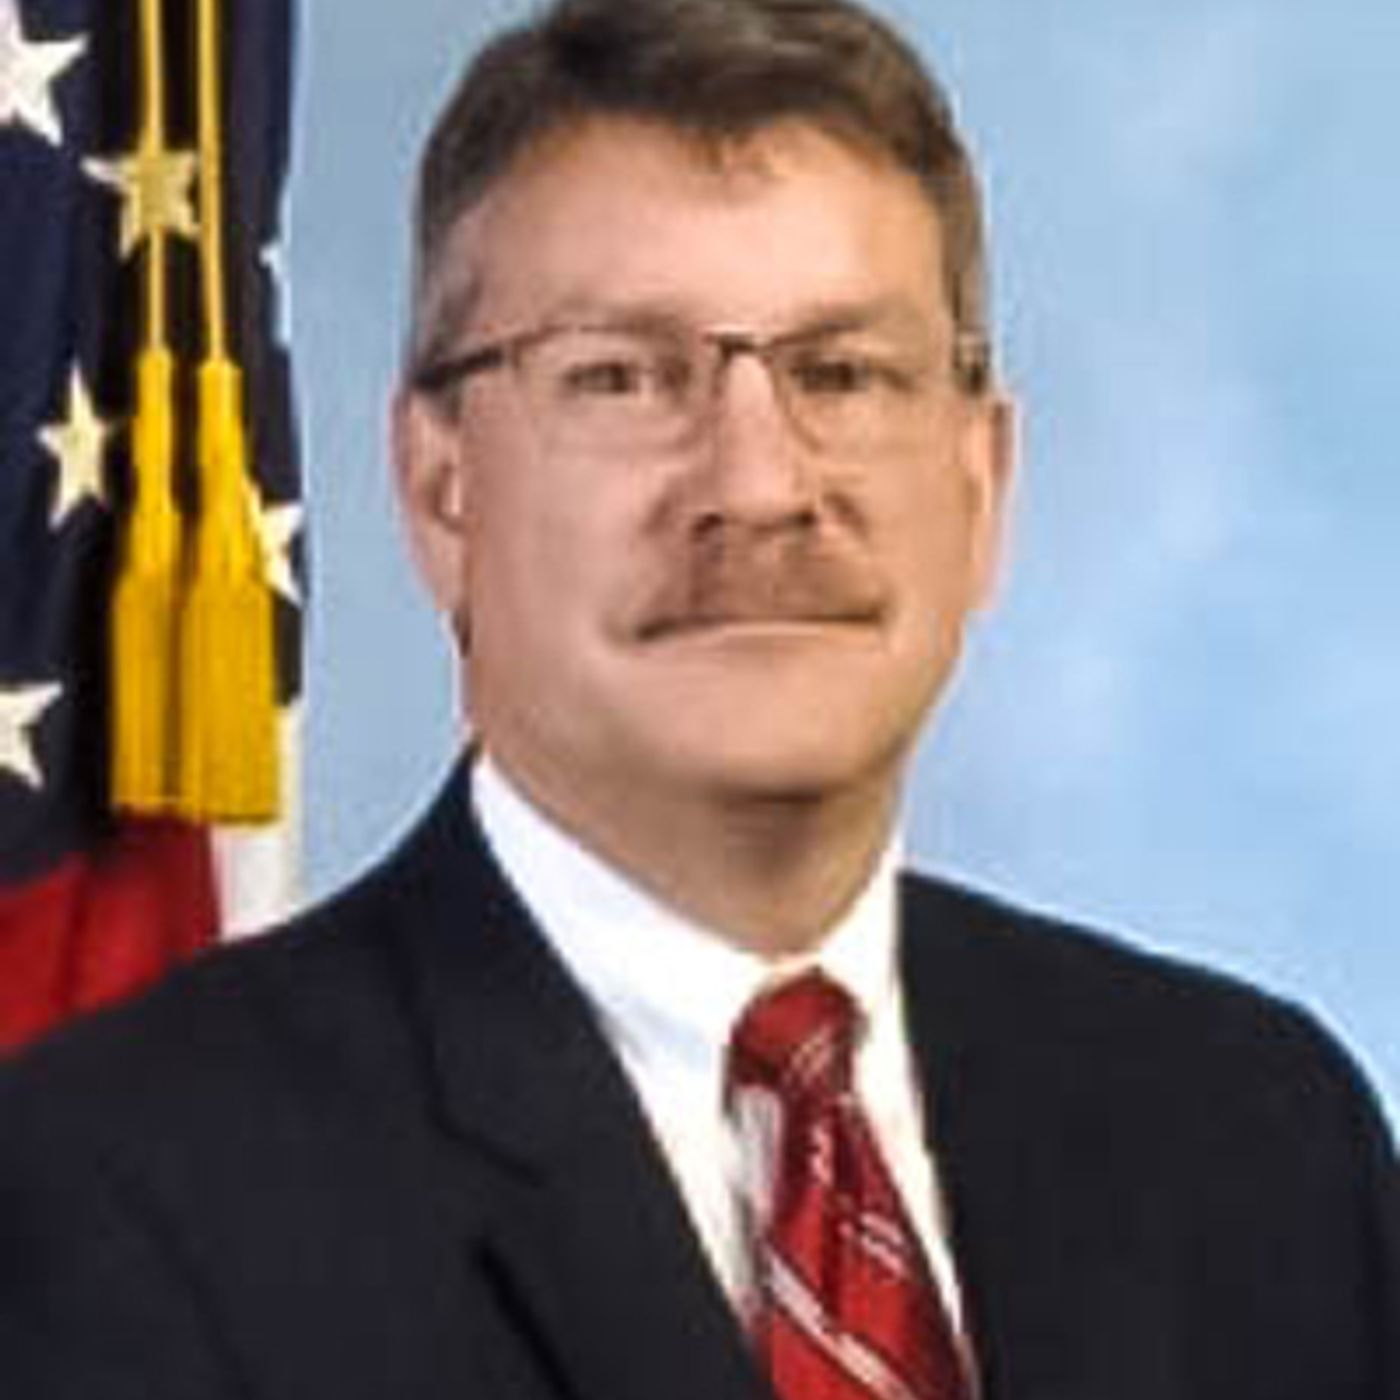 Ron Hosko Asst Dir FBI Interview on Comey, FBI, police, illegals  (ep#5-20/18)